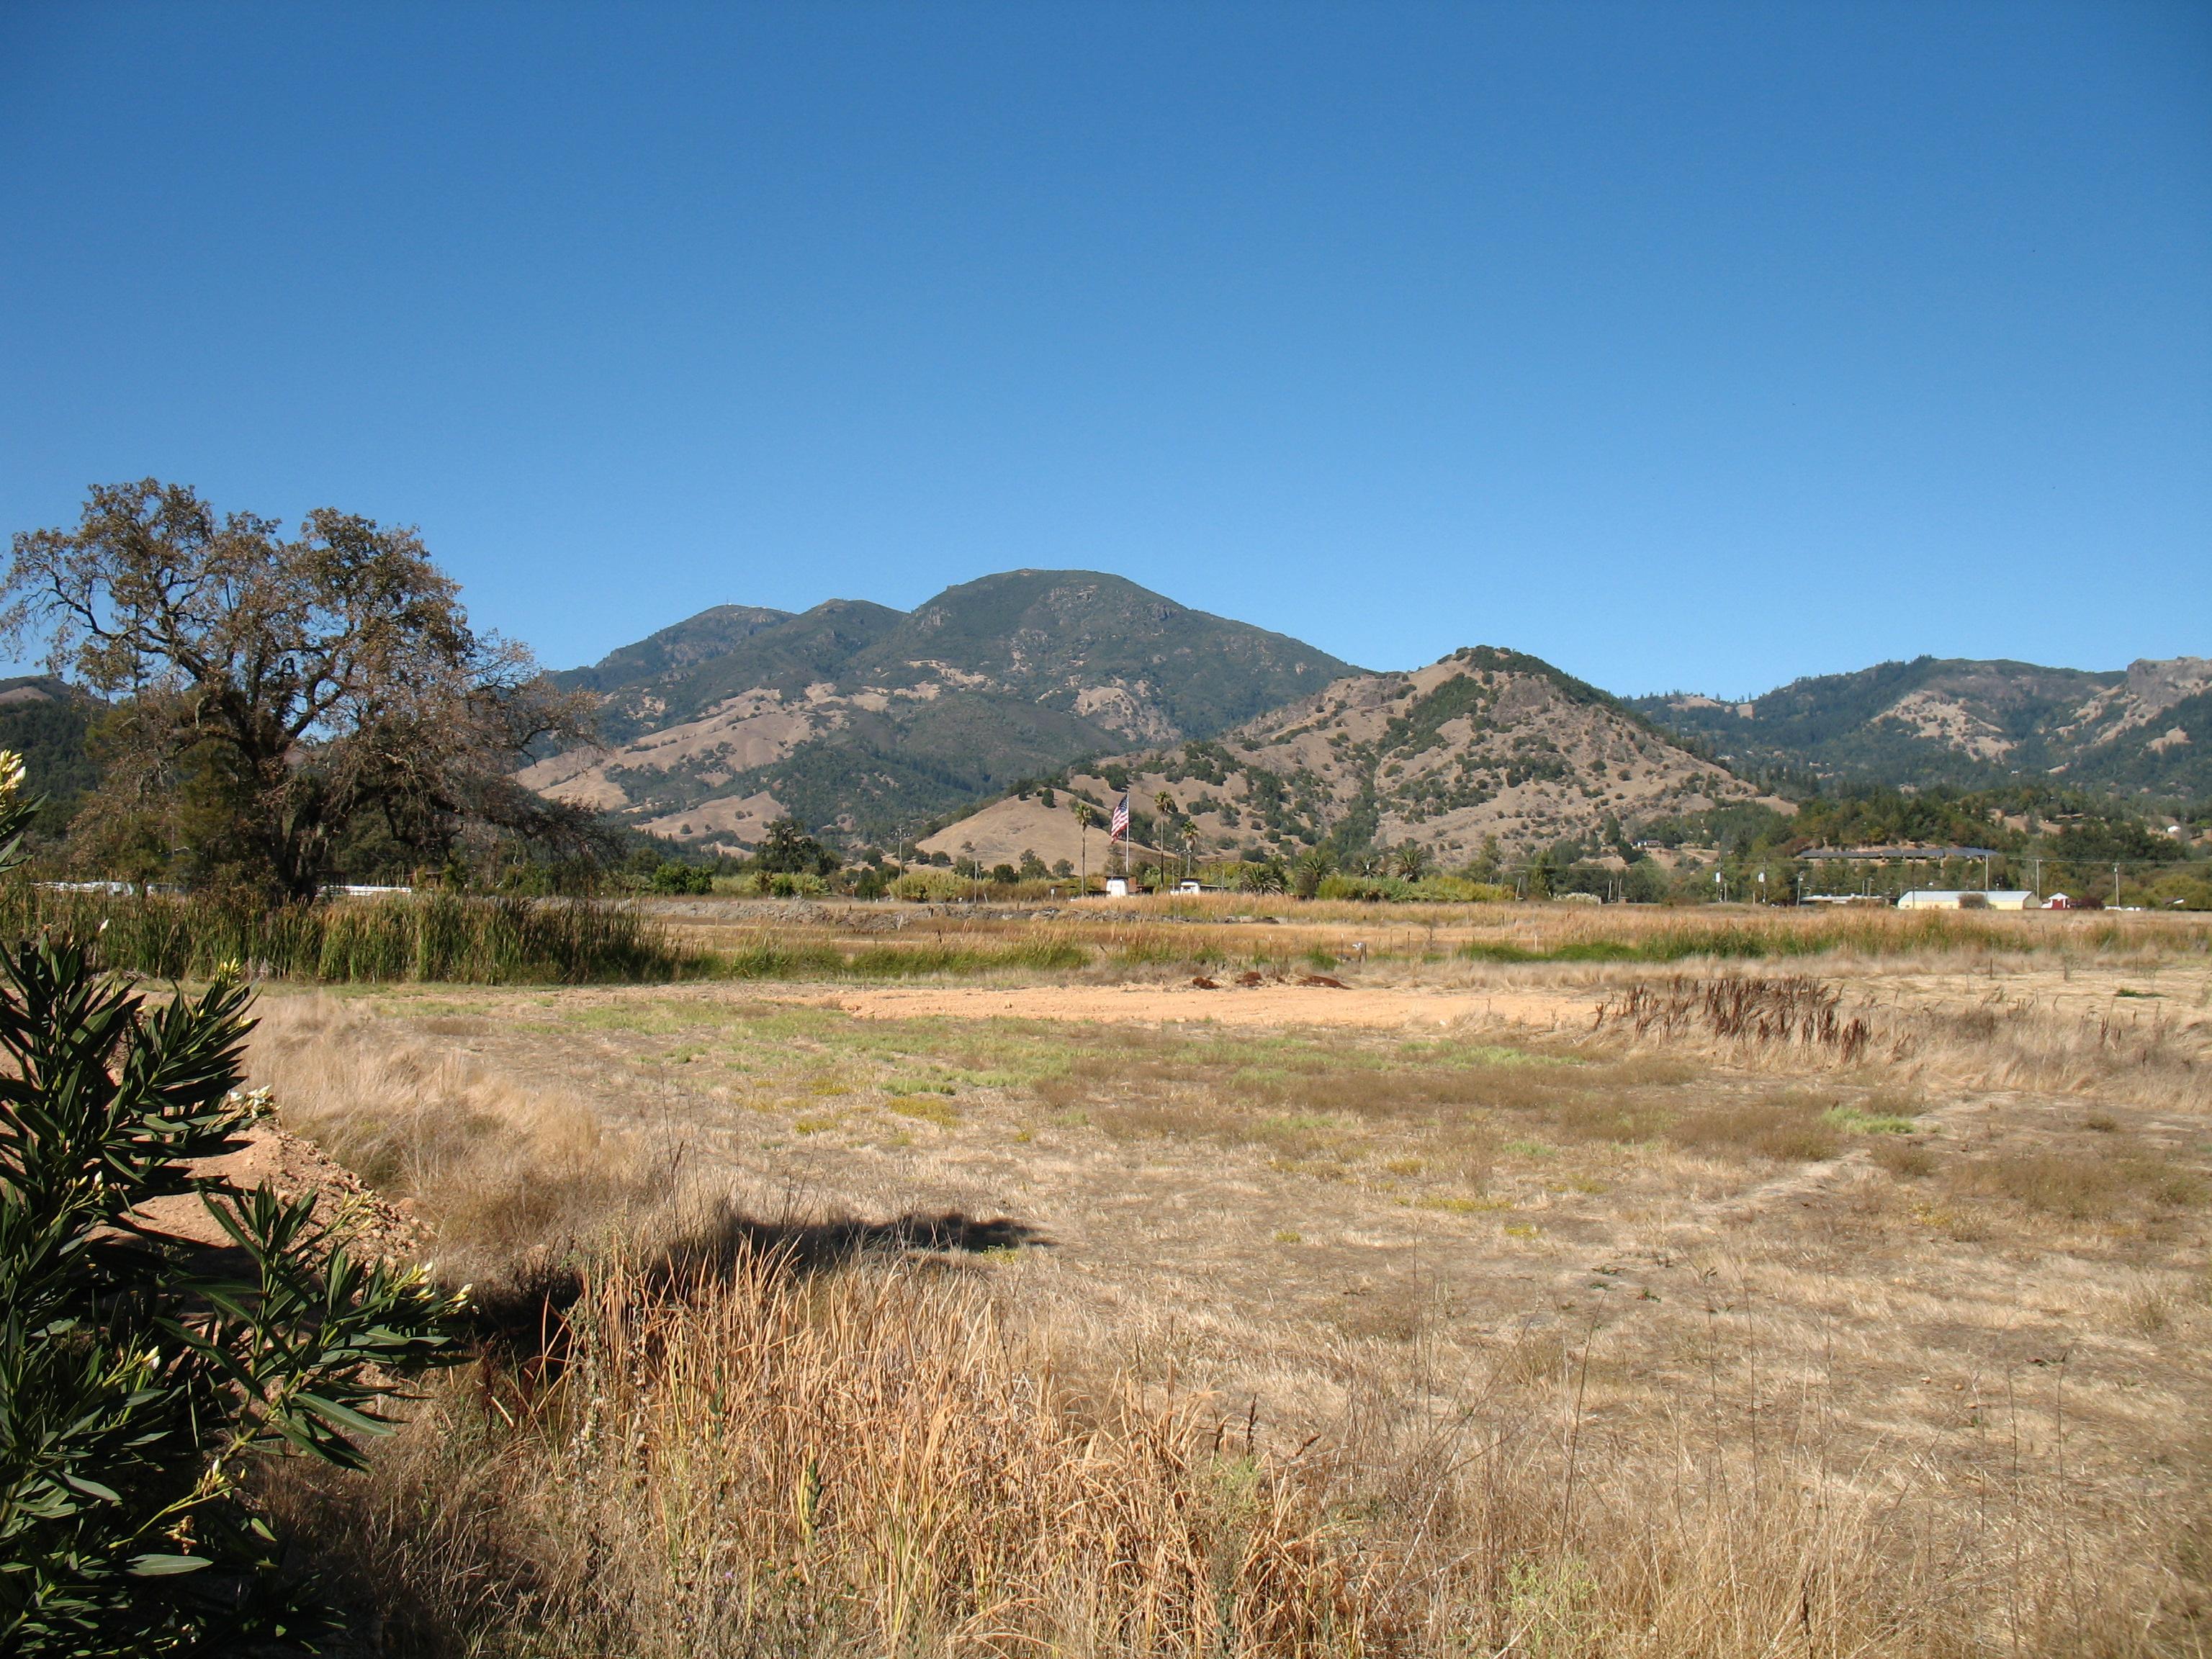 Mount Saint Helena (2007-10-08).JPG